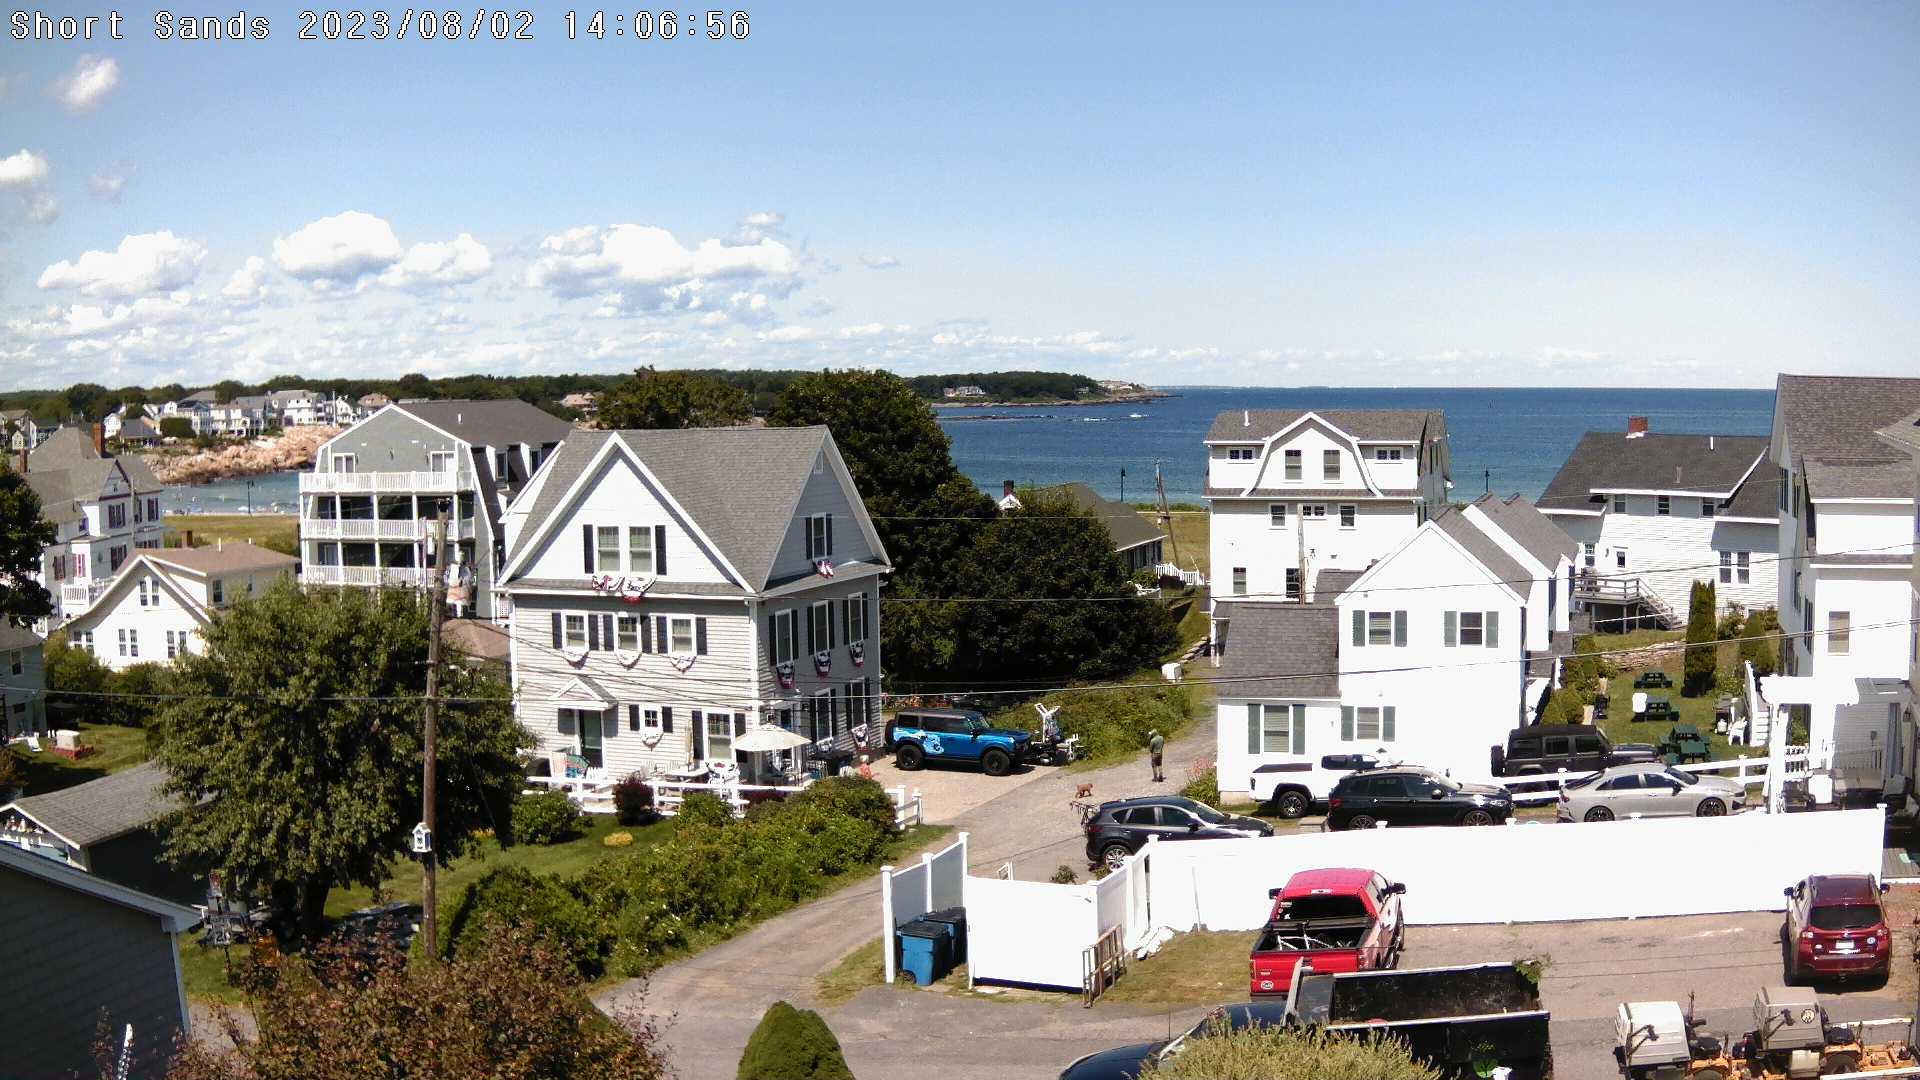 York Beach, Maine Ven. 14:07